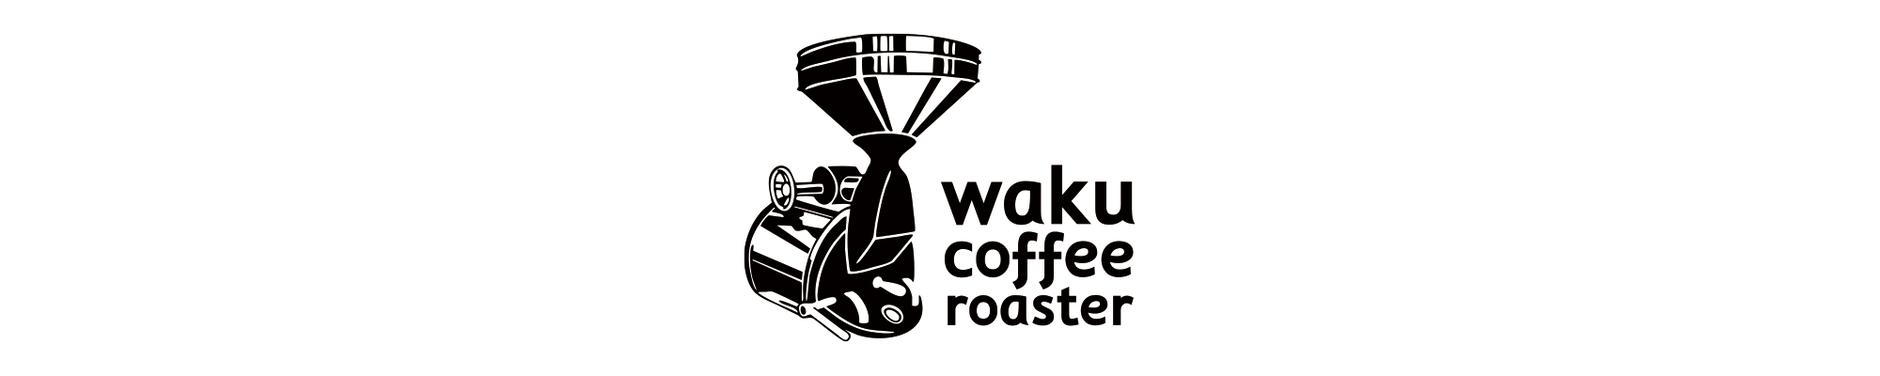 waku coffee roaster online store